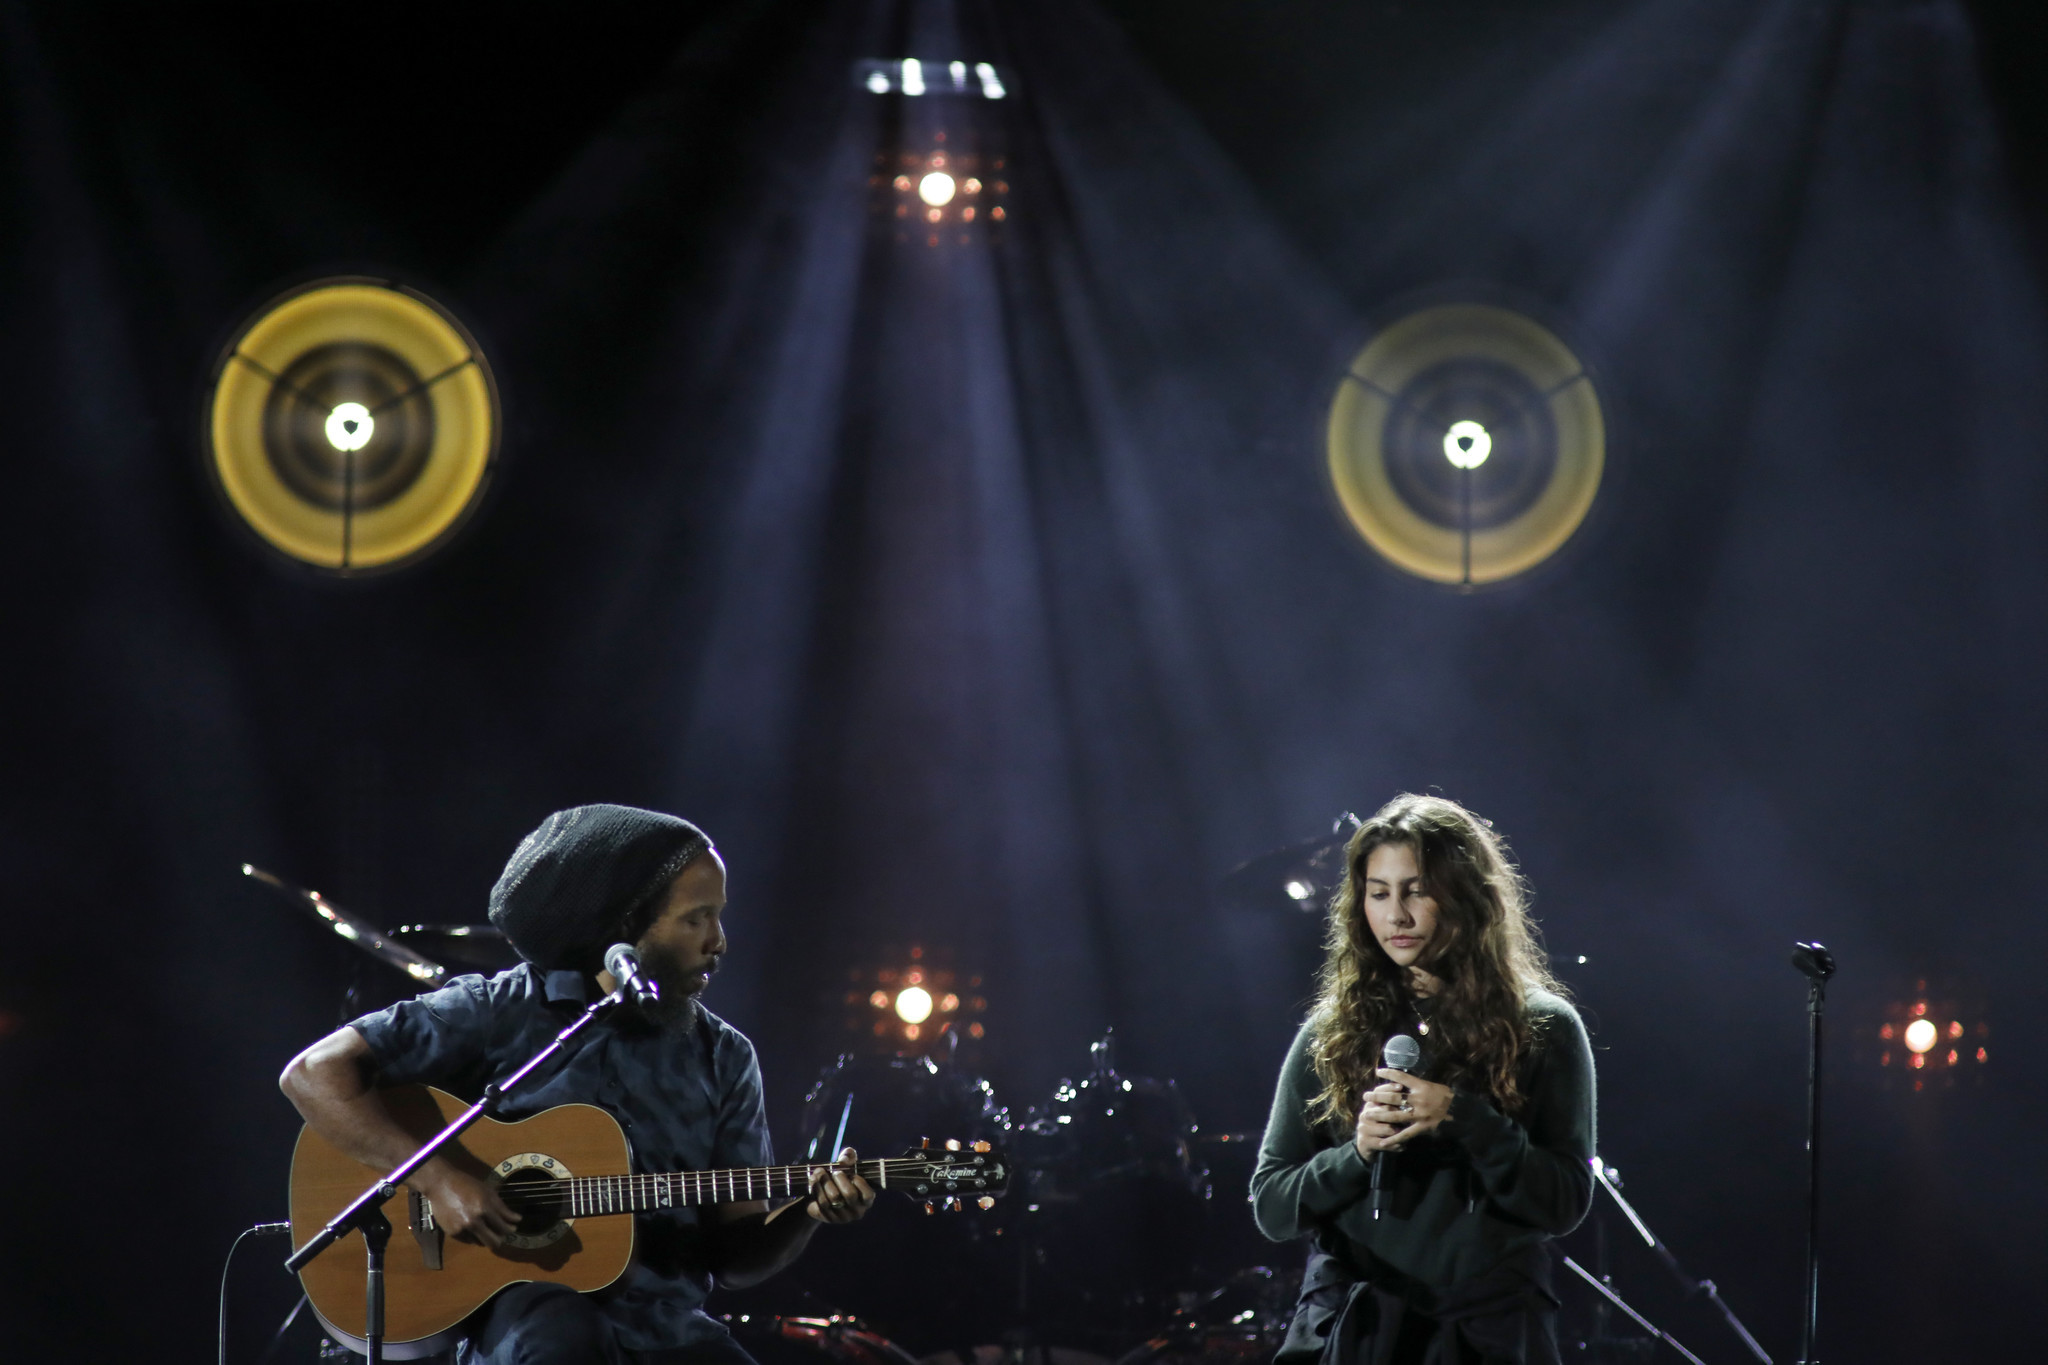 Ziggy Marley and Toni Cornell